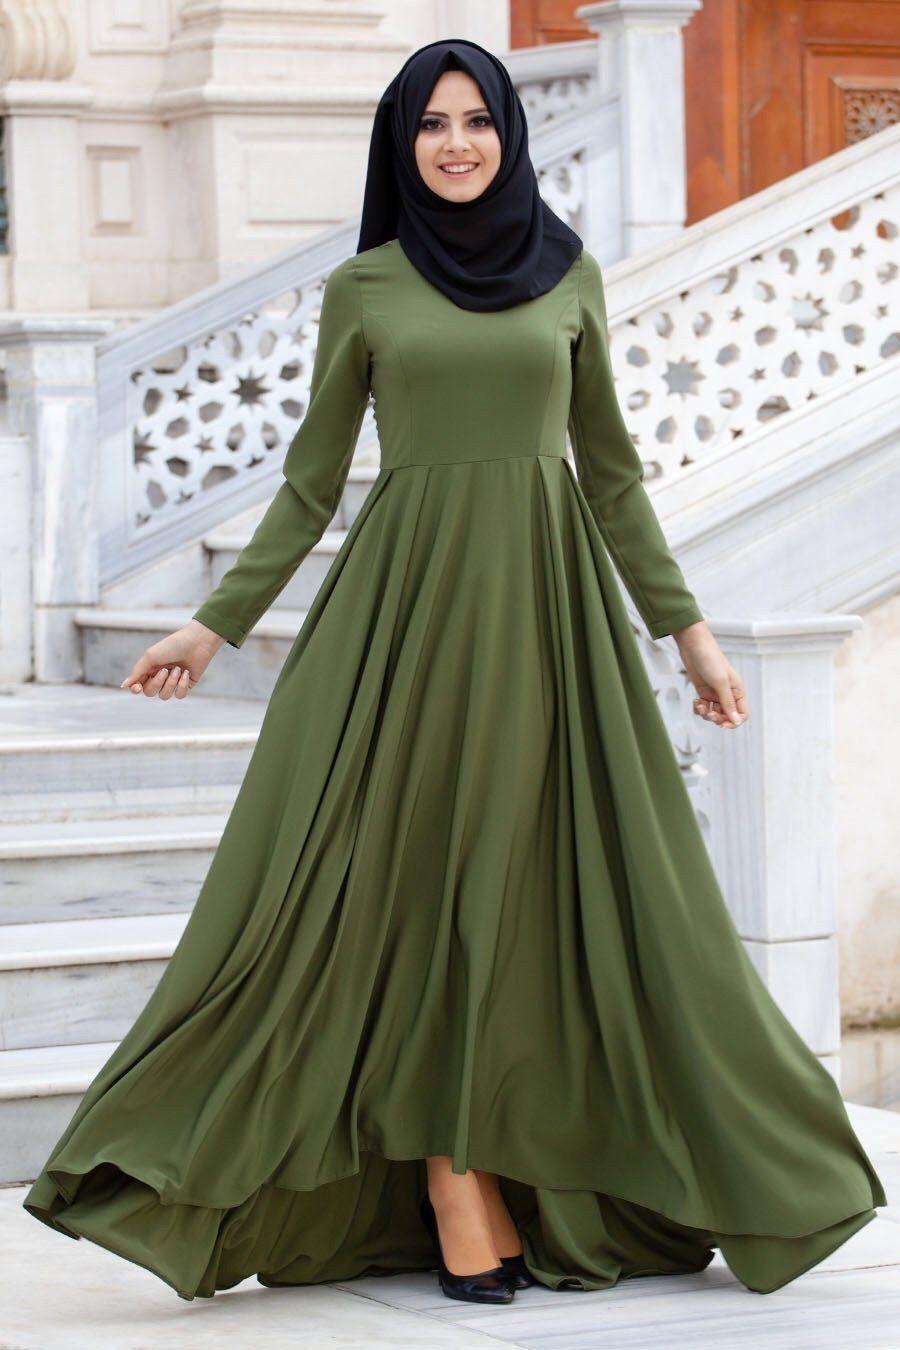 Olive green formal ball gown الحجاب اناقة pinterest ball